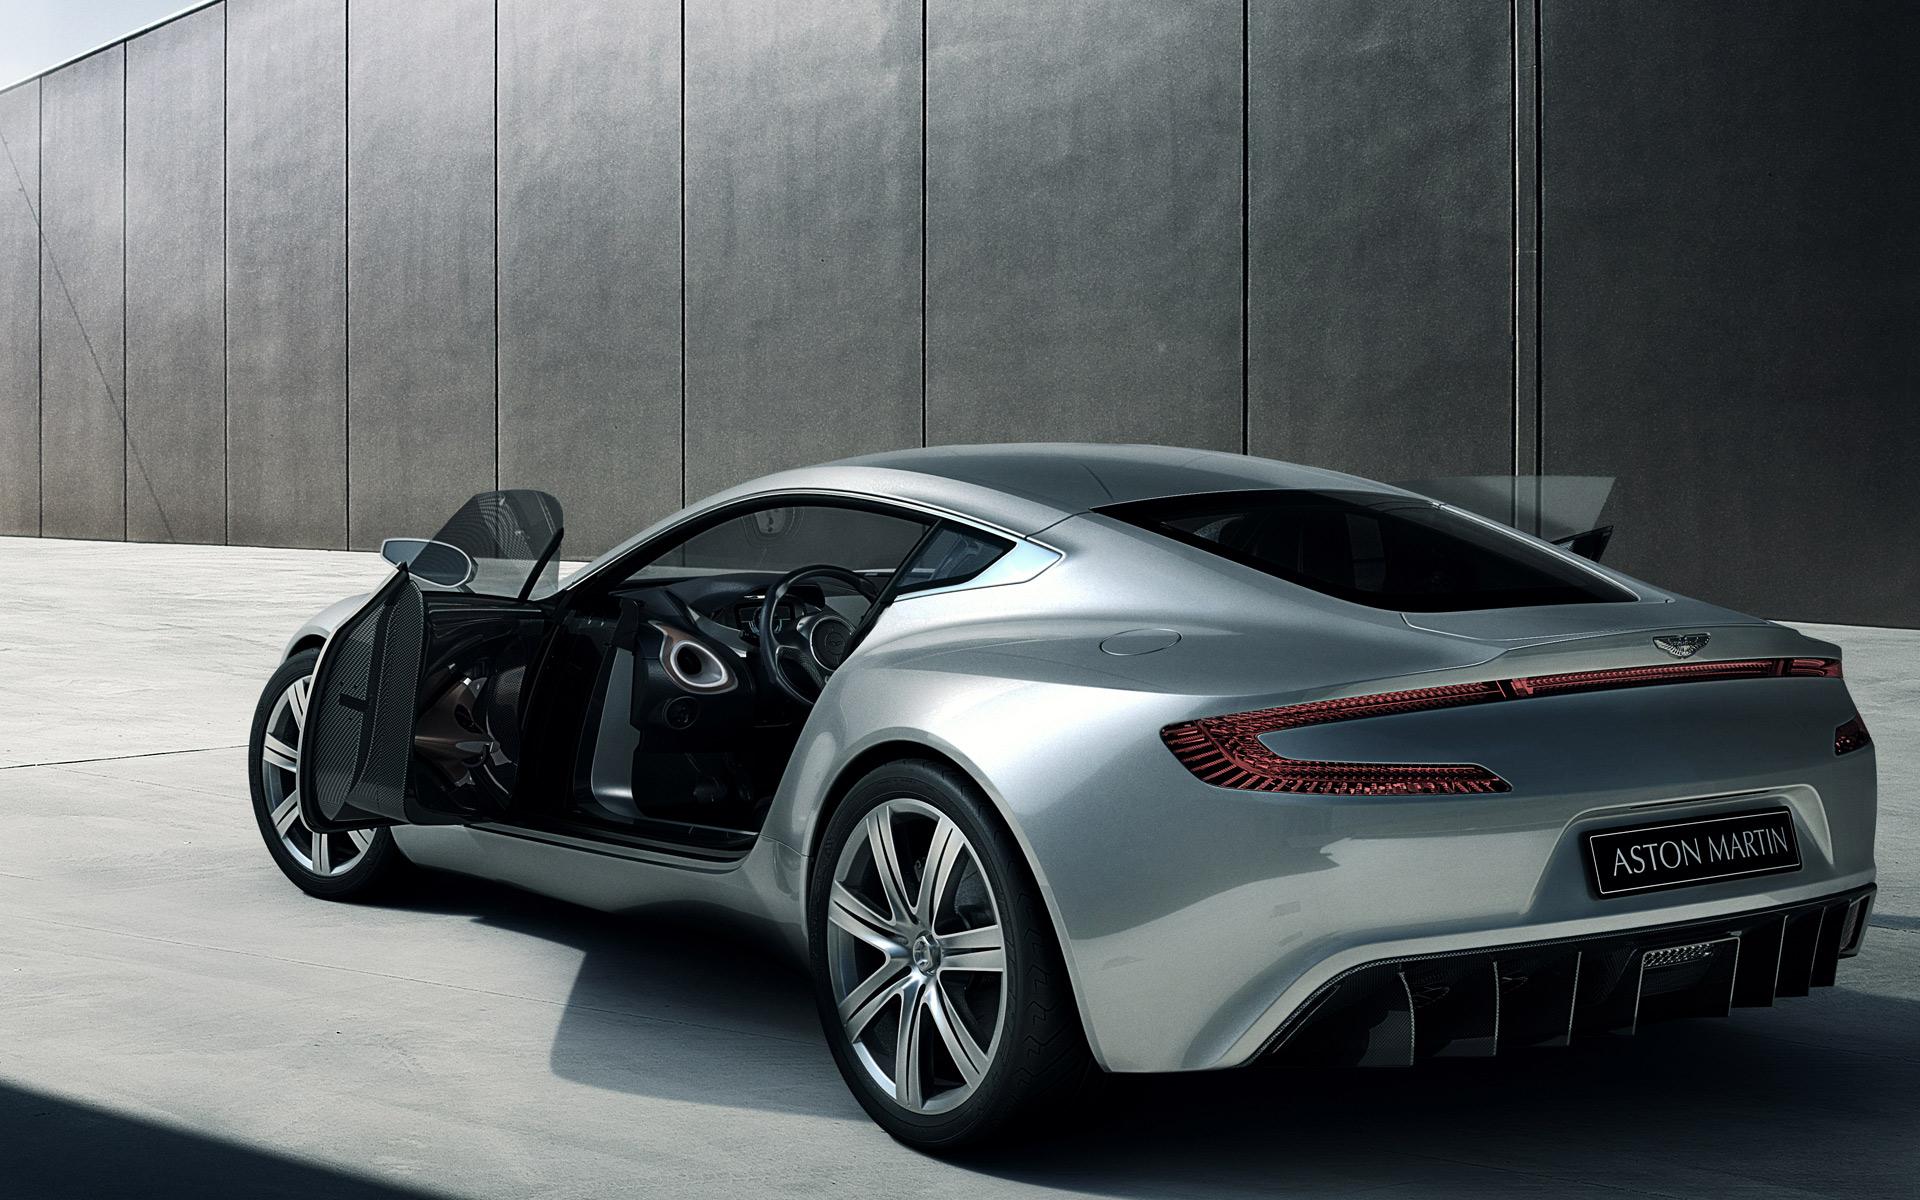 Aston Martin Wallpapers  WallpaperSafari